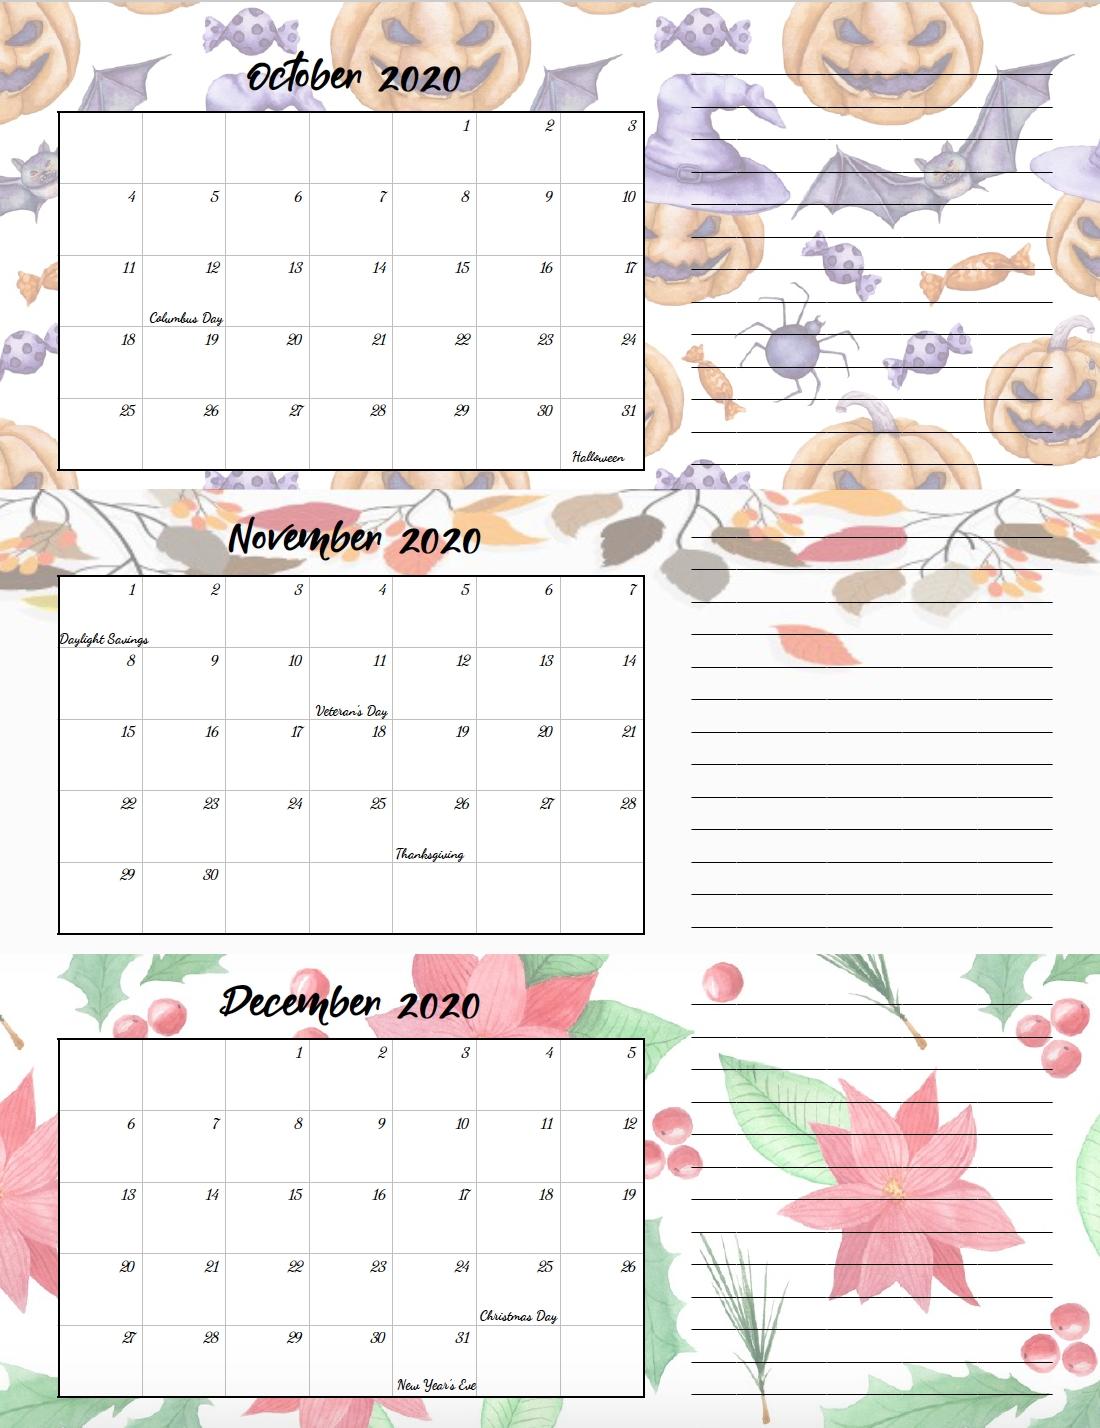 Free Printable 2020 Quarterly Calendars With Holidays: 3 within 2020 Printable Quarterly Calendar Template